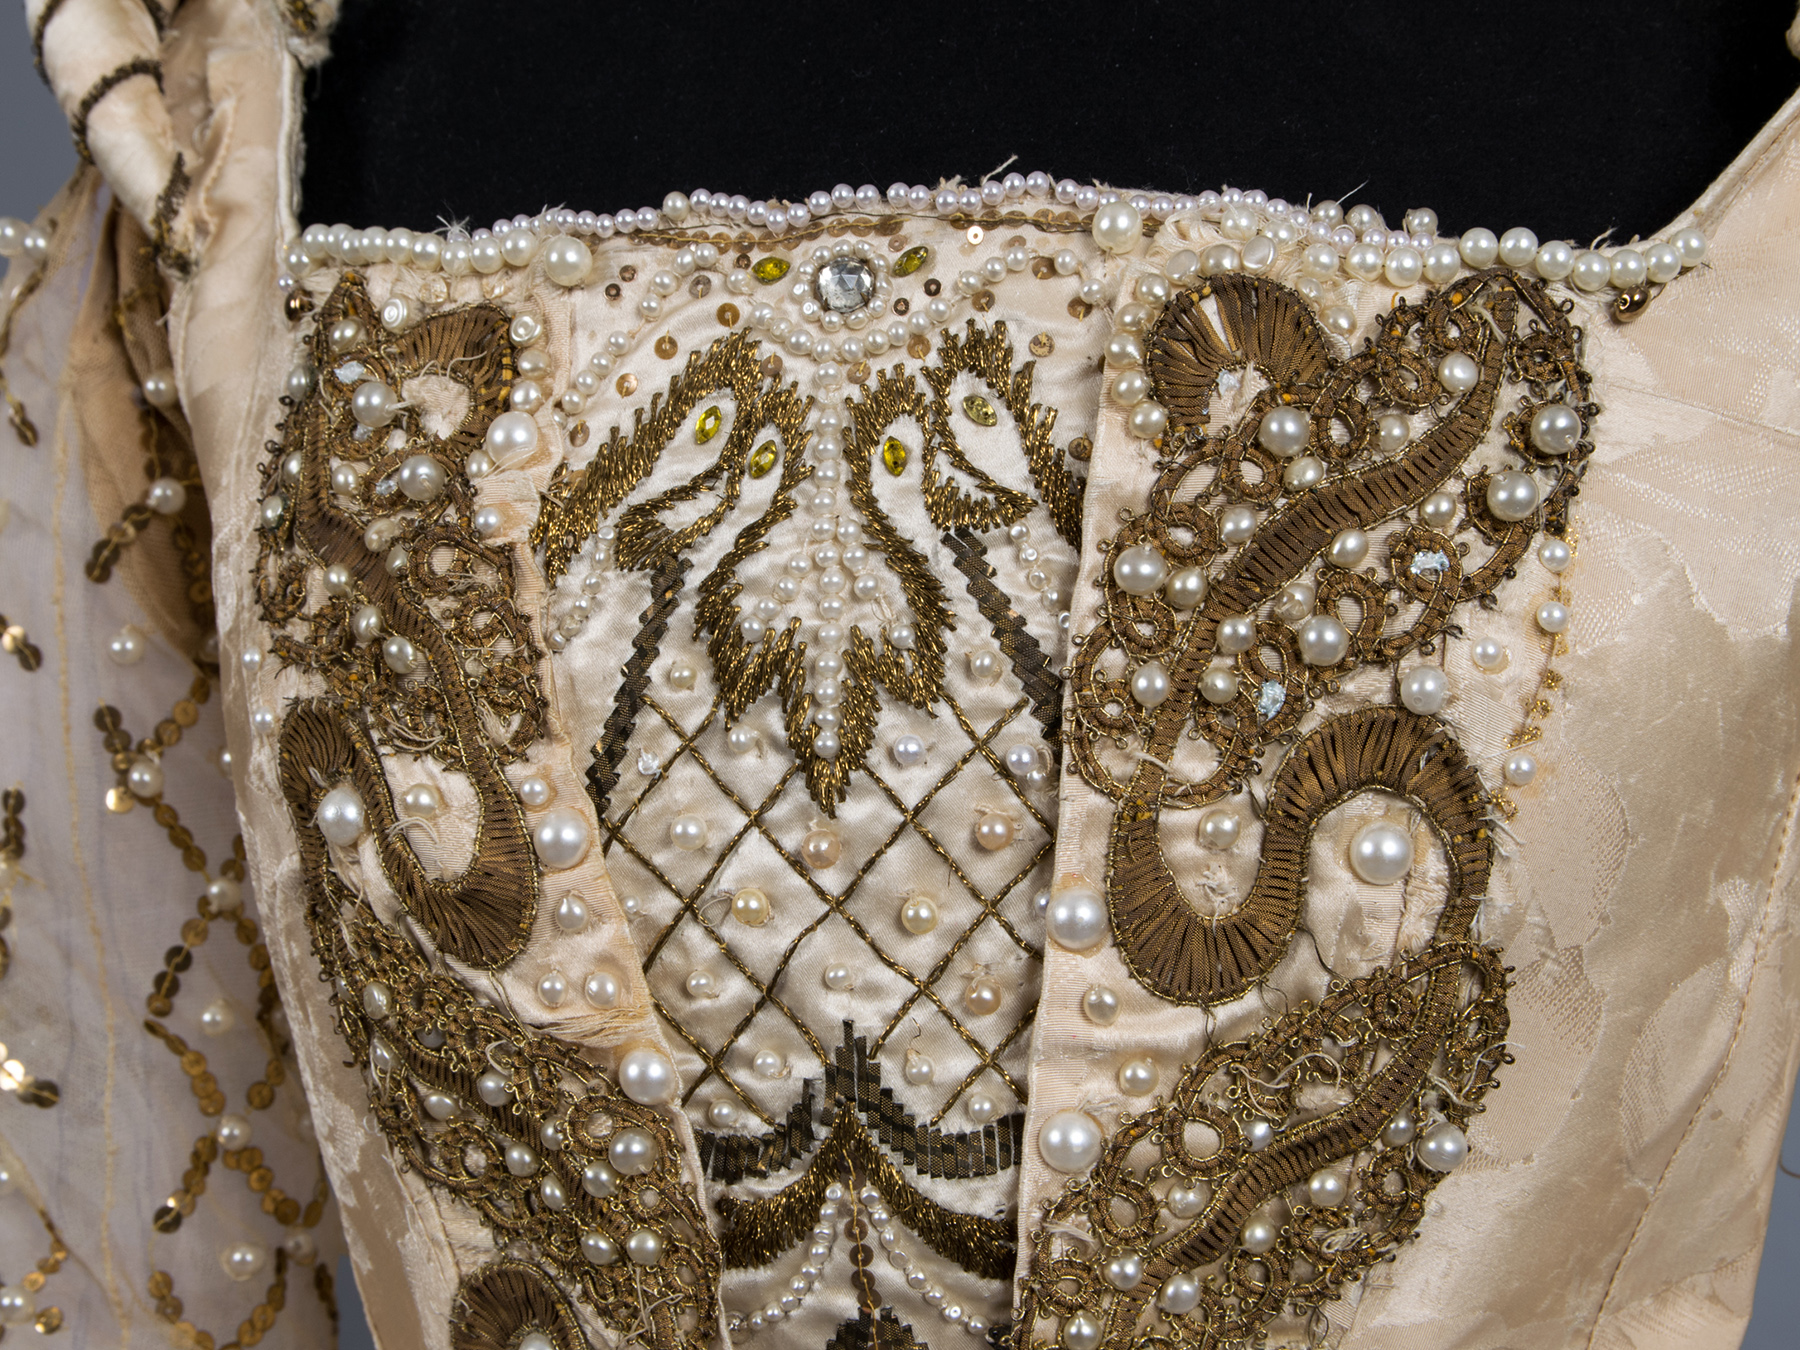 Two Centuries of French Fashion, An Ephemeral Exhibit